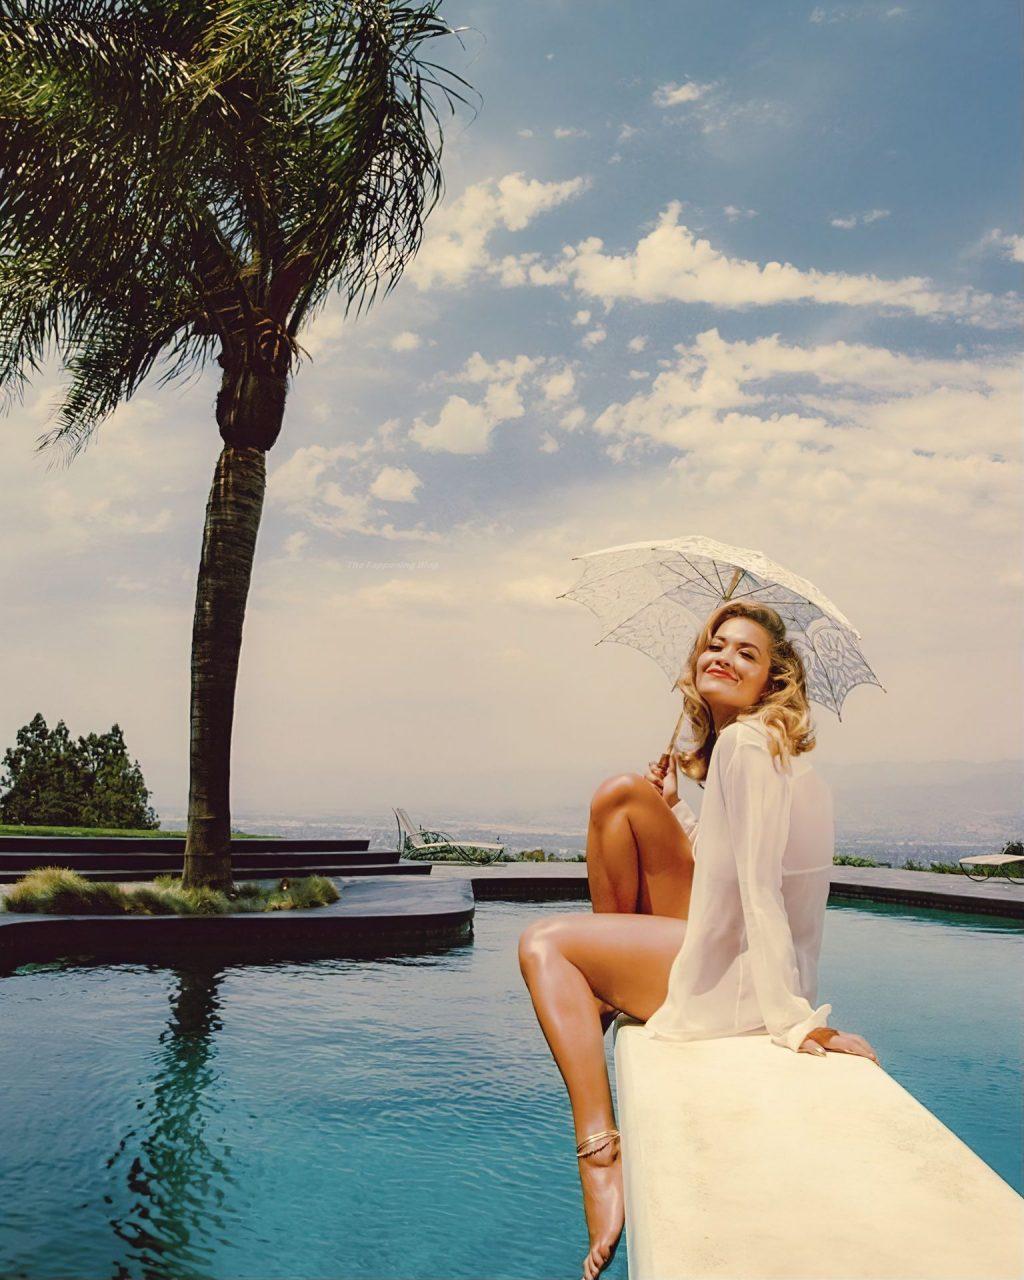 Rita Ora Flaunts Her Sexy Body in a White Bikini (10 Photos + Video)